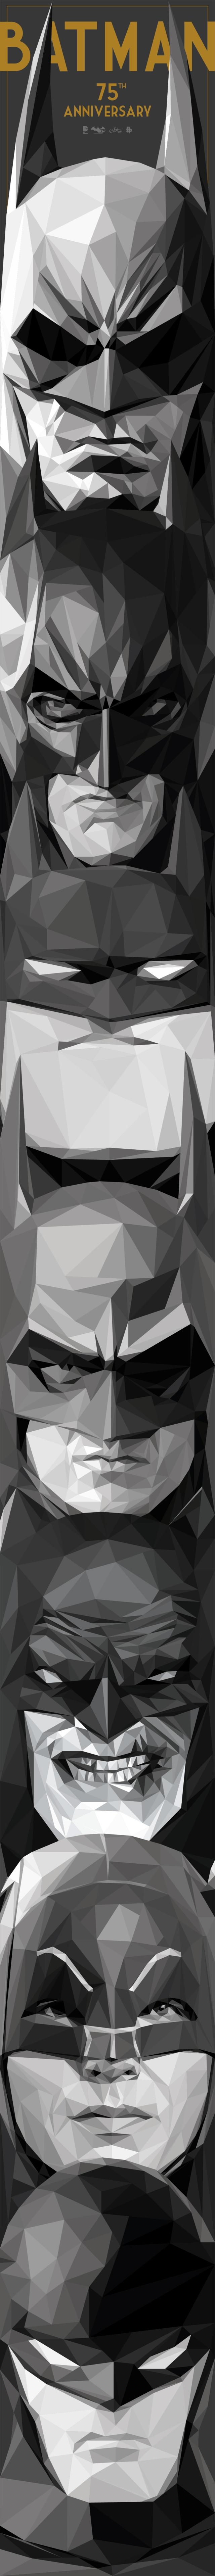 s2lart - Batman 75th-1